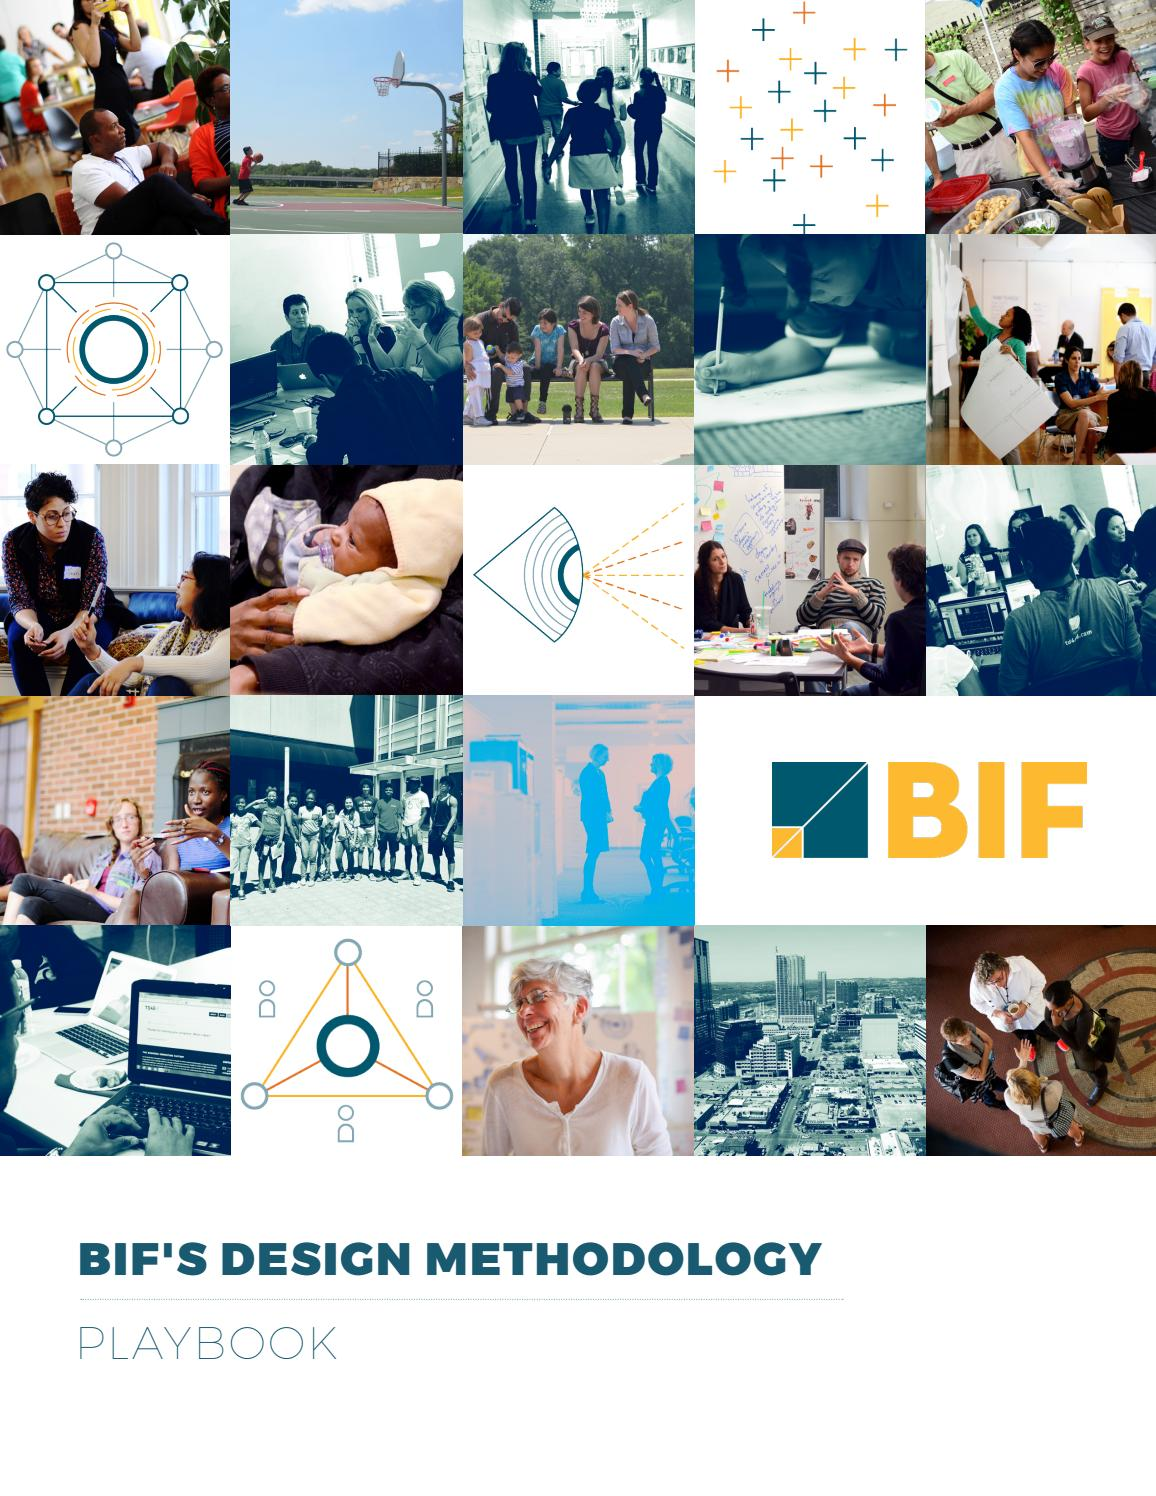 BIF's Design Methodology Playbook